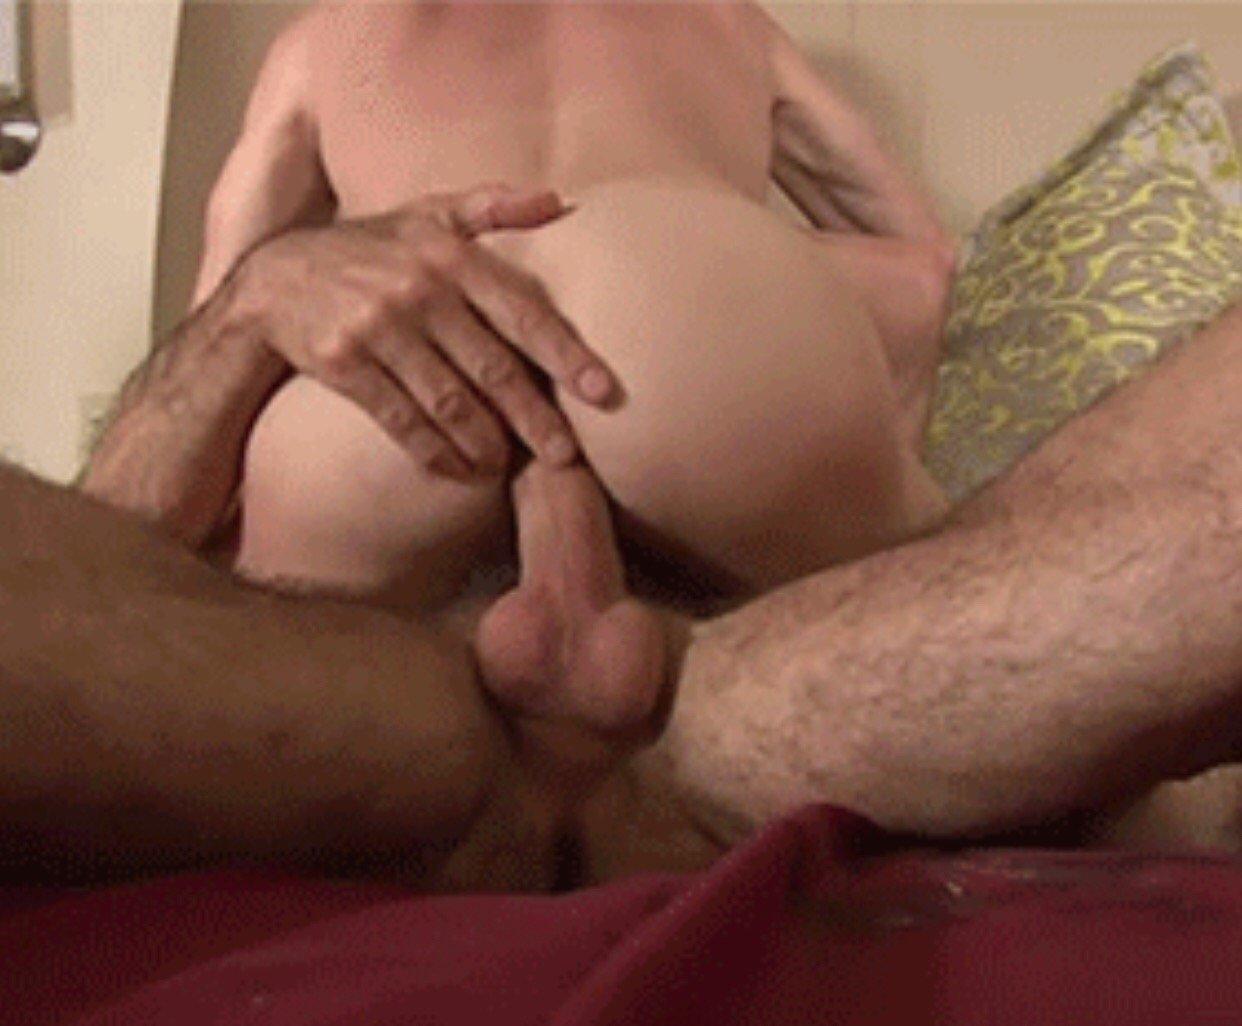 Prostate orgasms